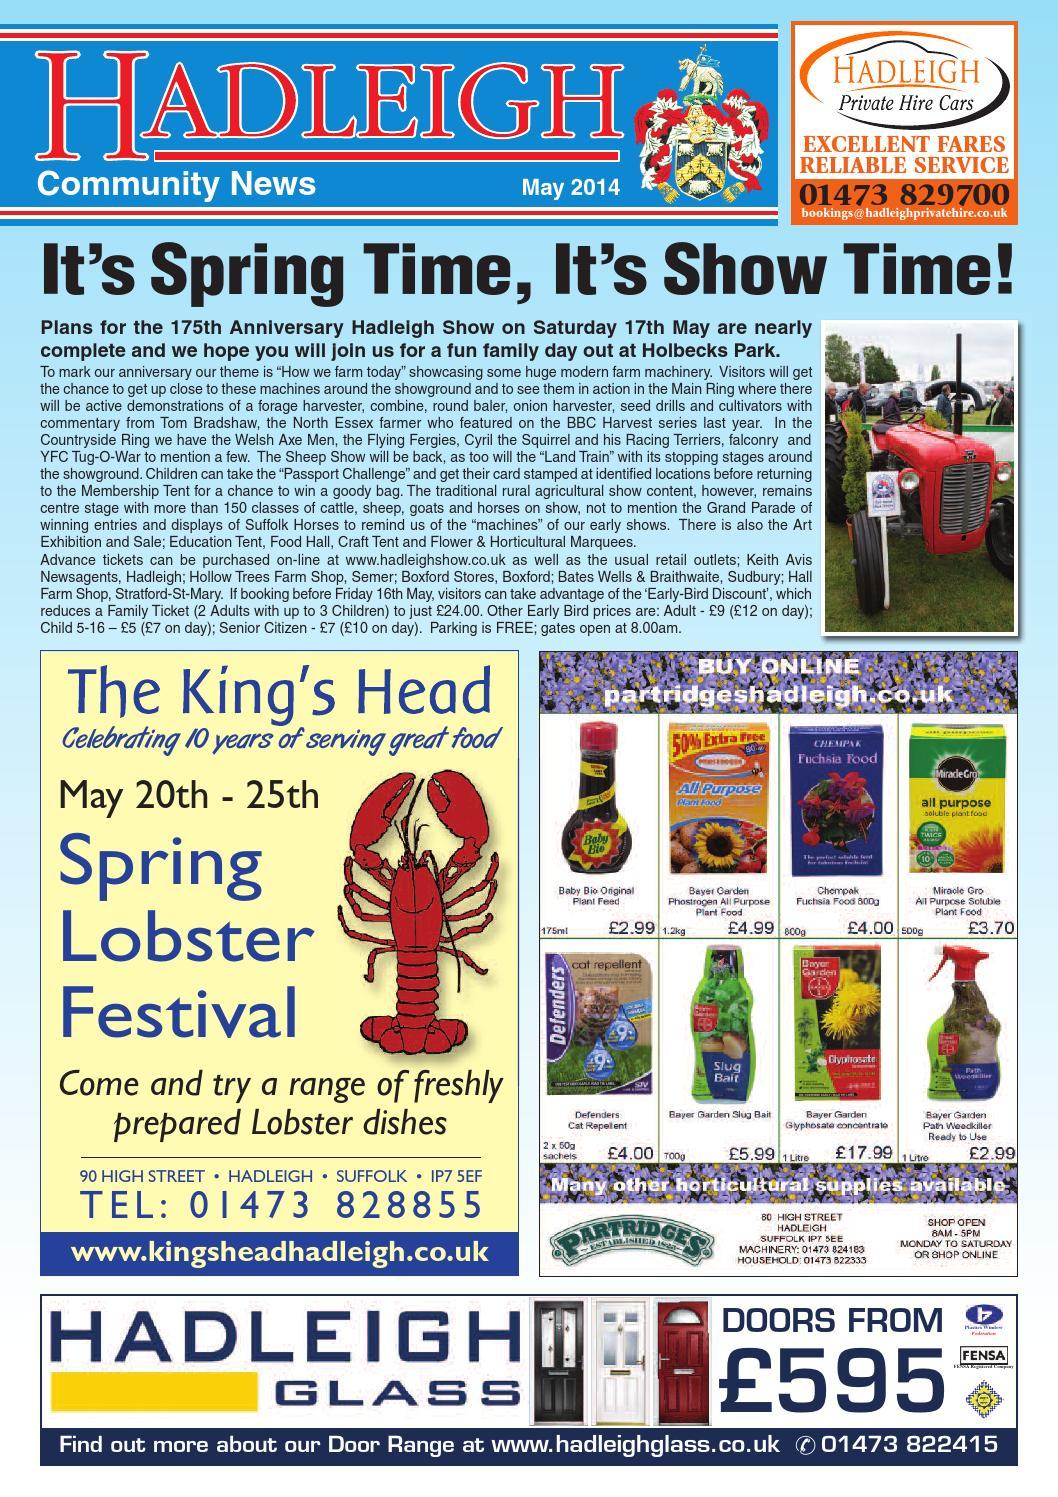 Hadleigh Community News, May 2014